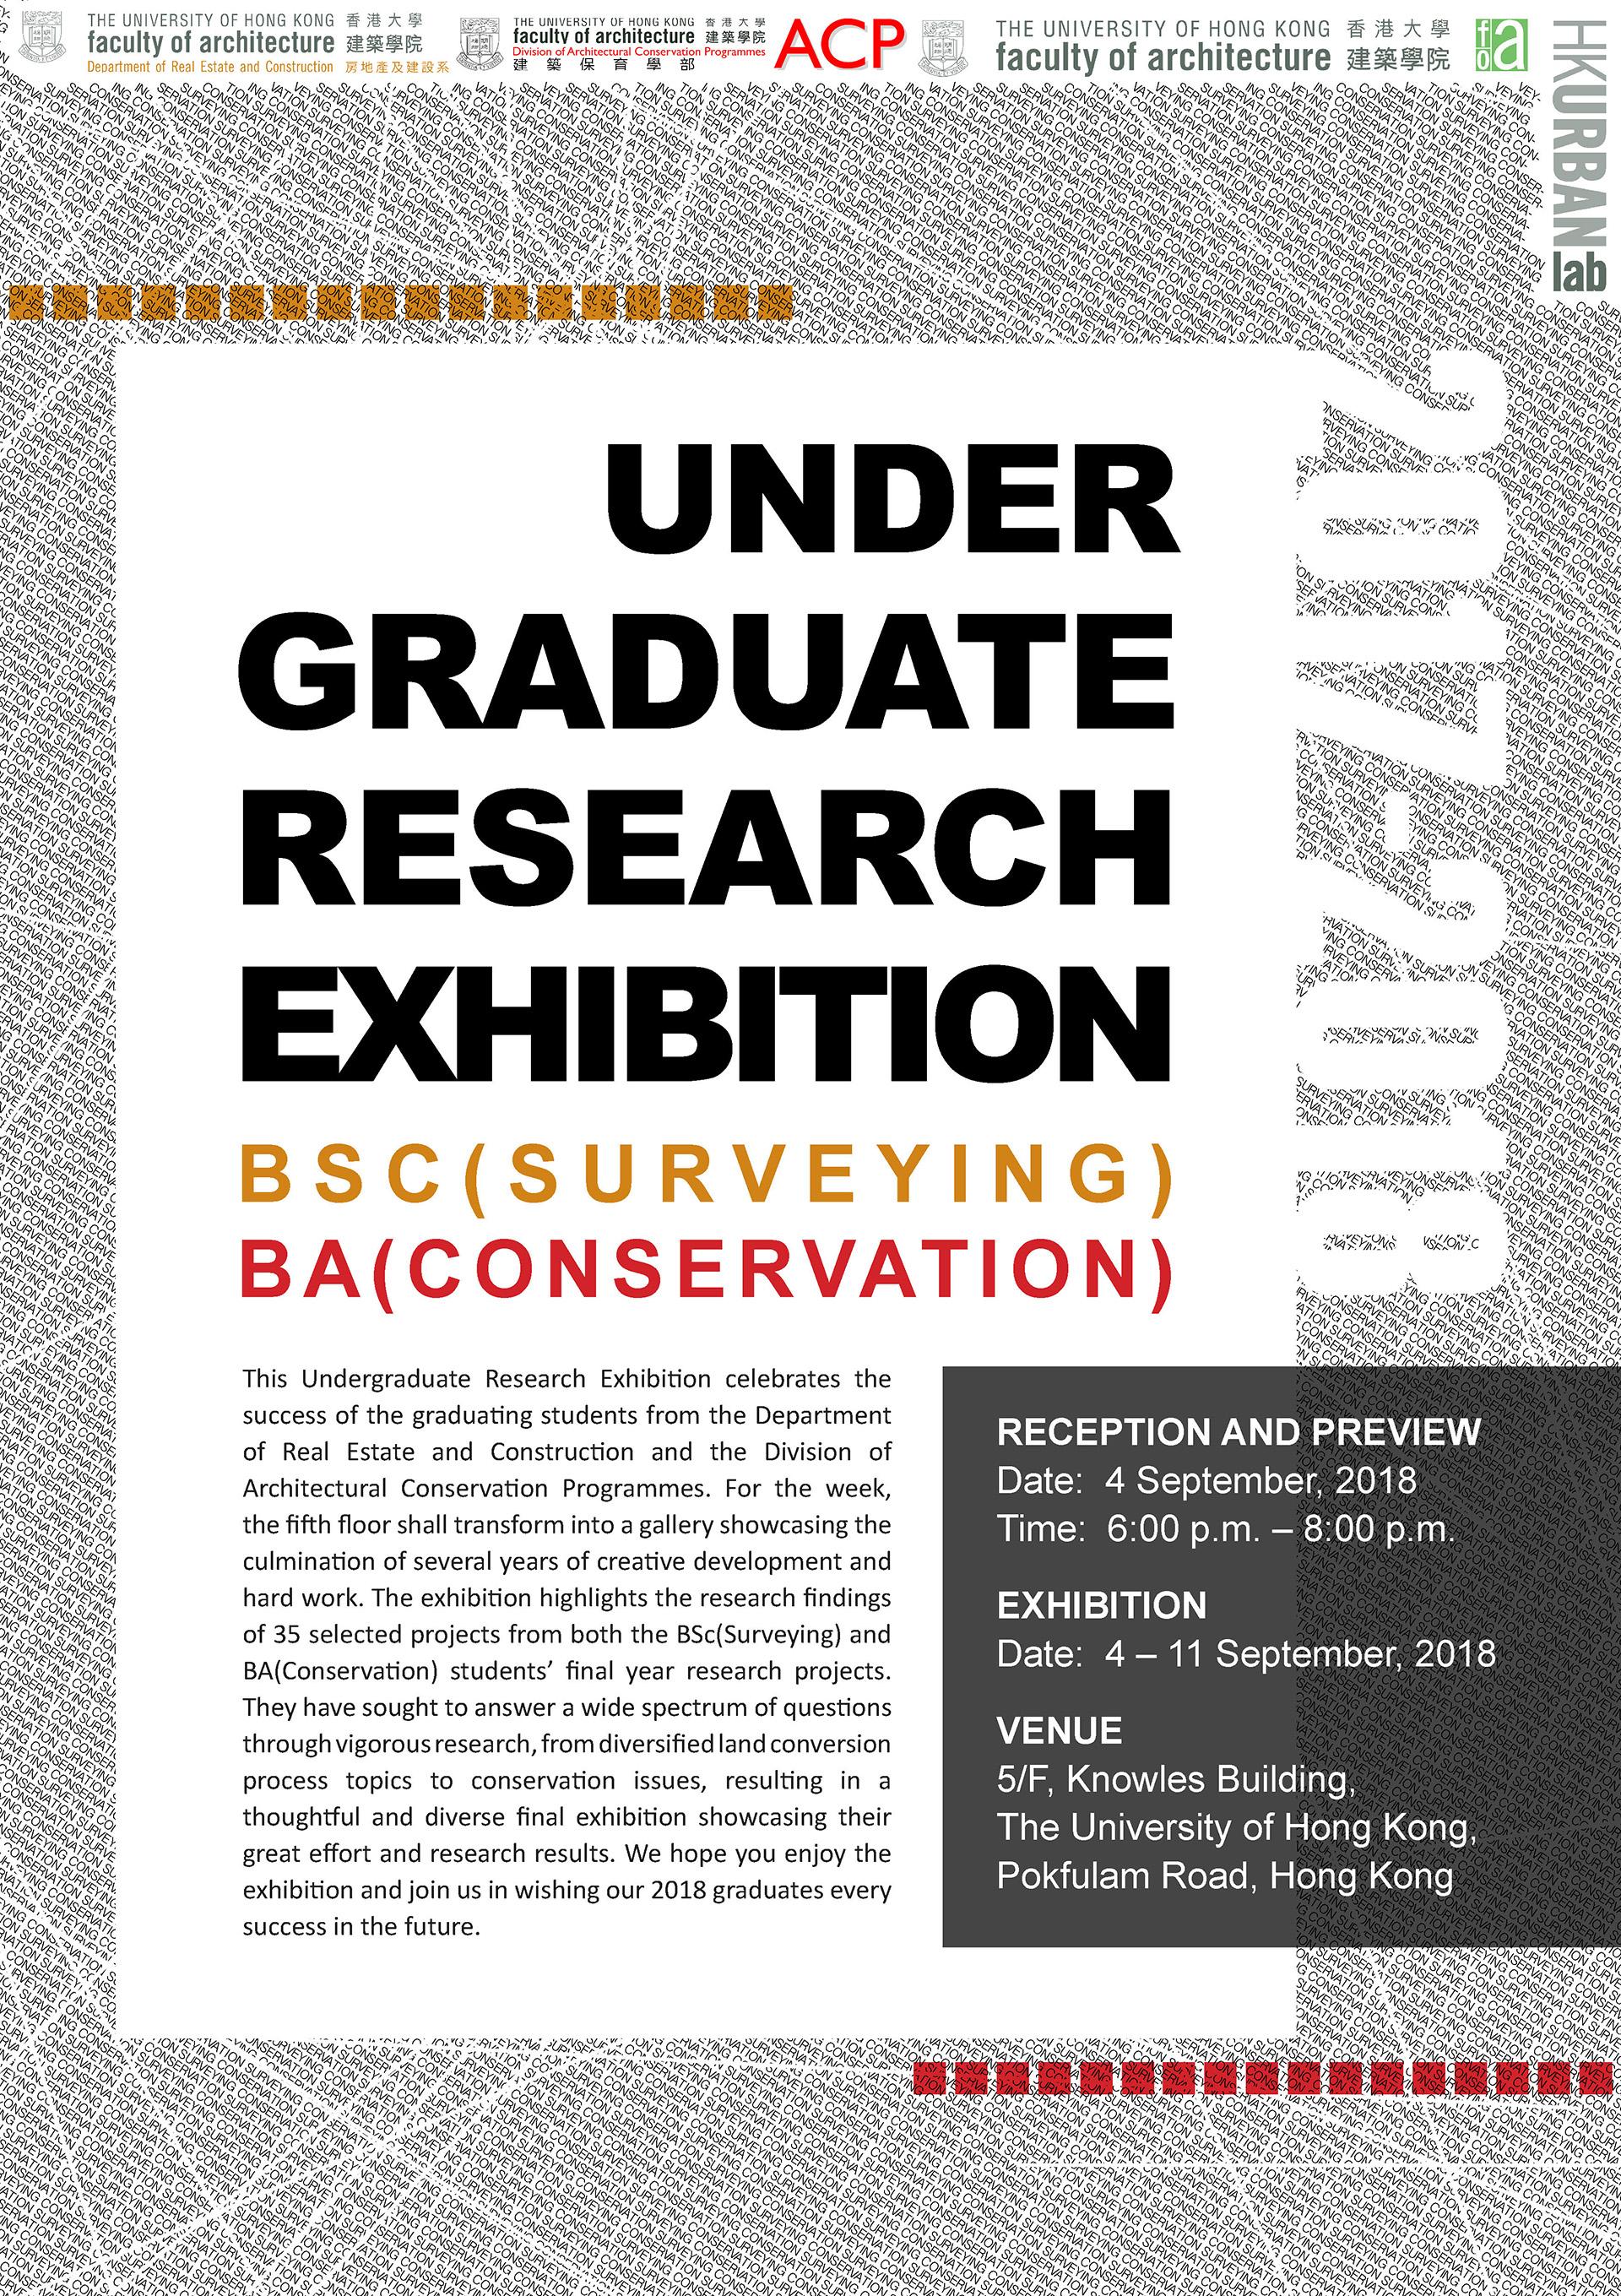 Undergraduate Research Exhibition